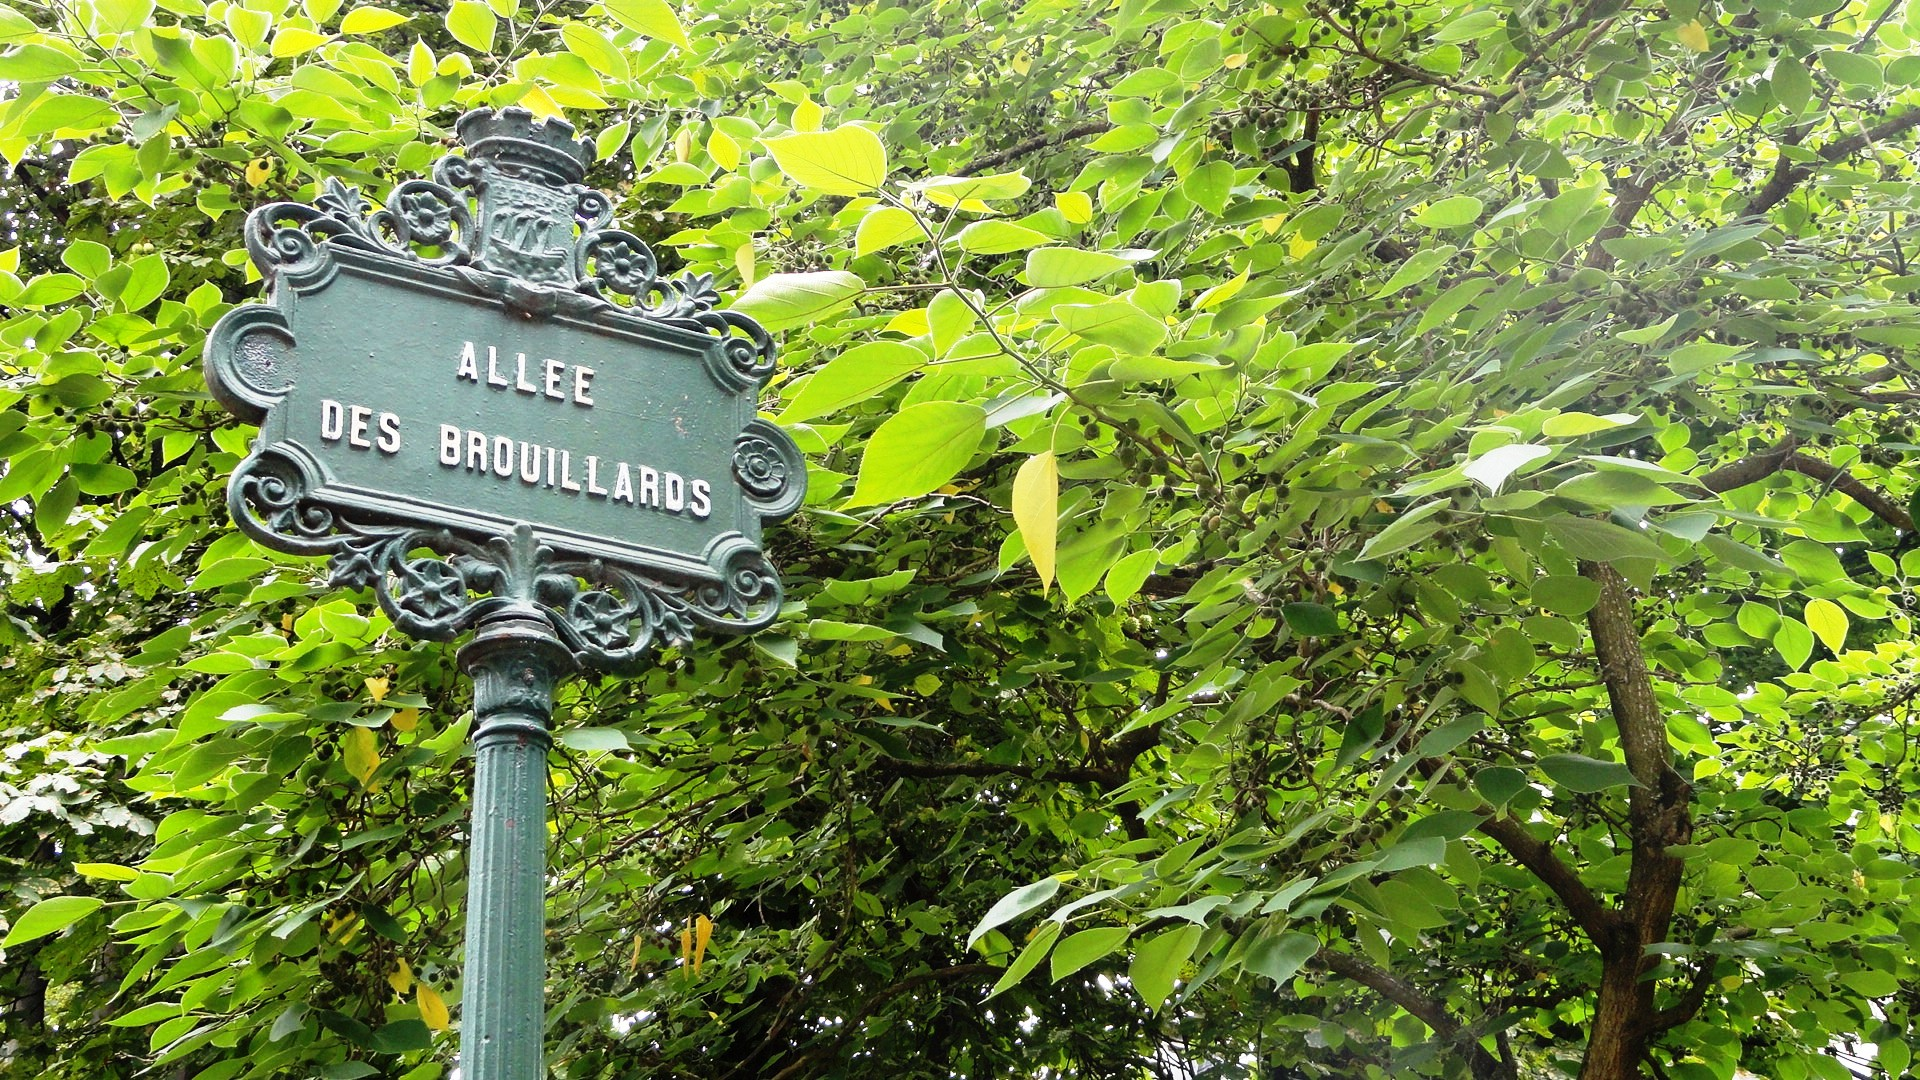 Montmartre - Allée des Brouillards